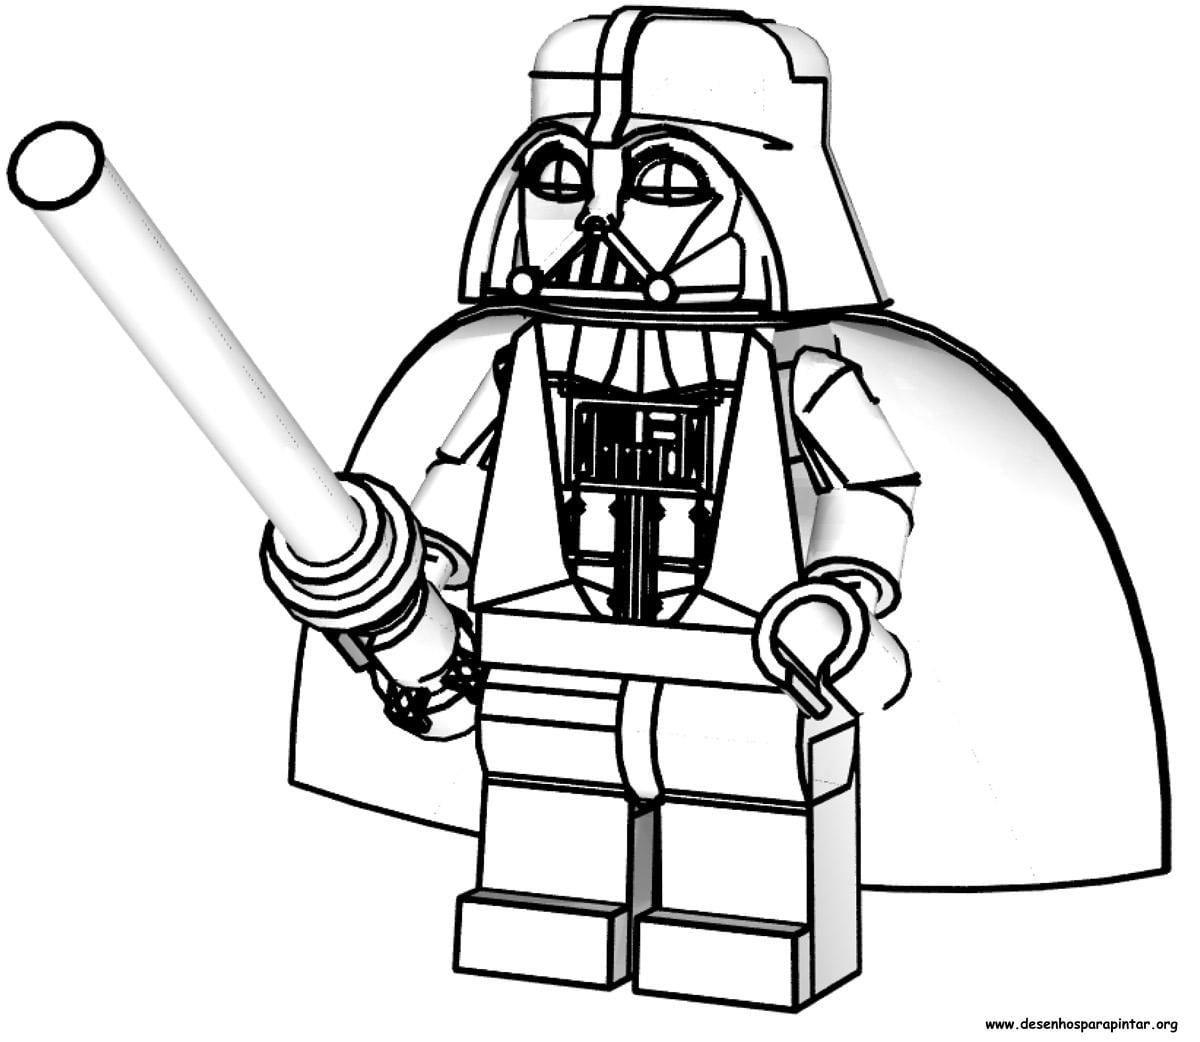 Desenhos Para Colorir Lego Batman Coloring City Star